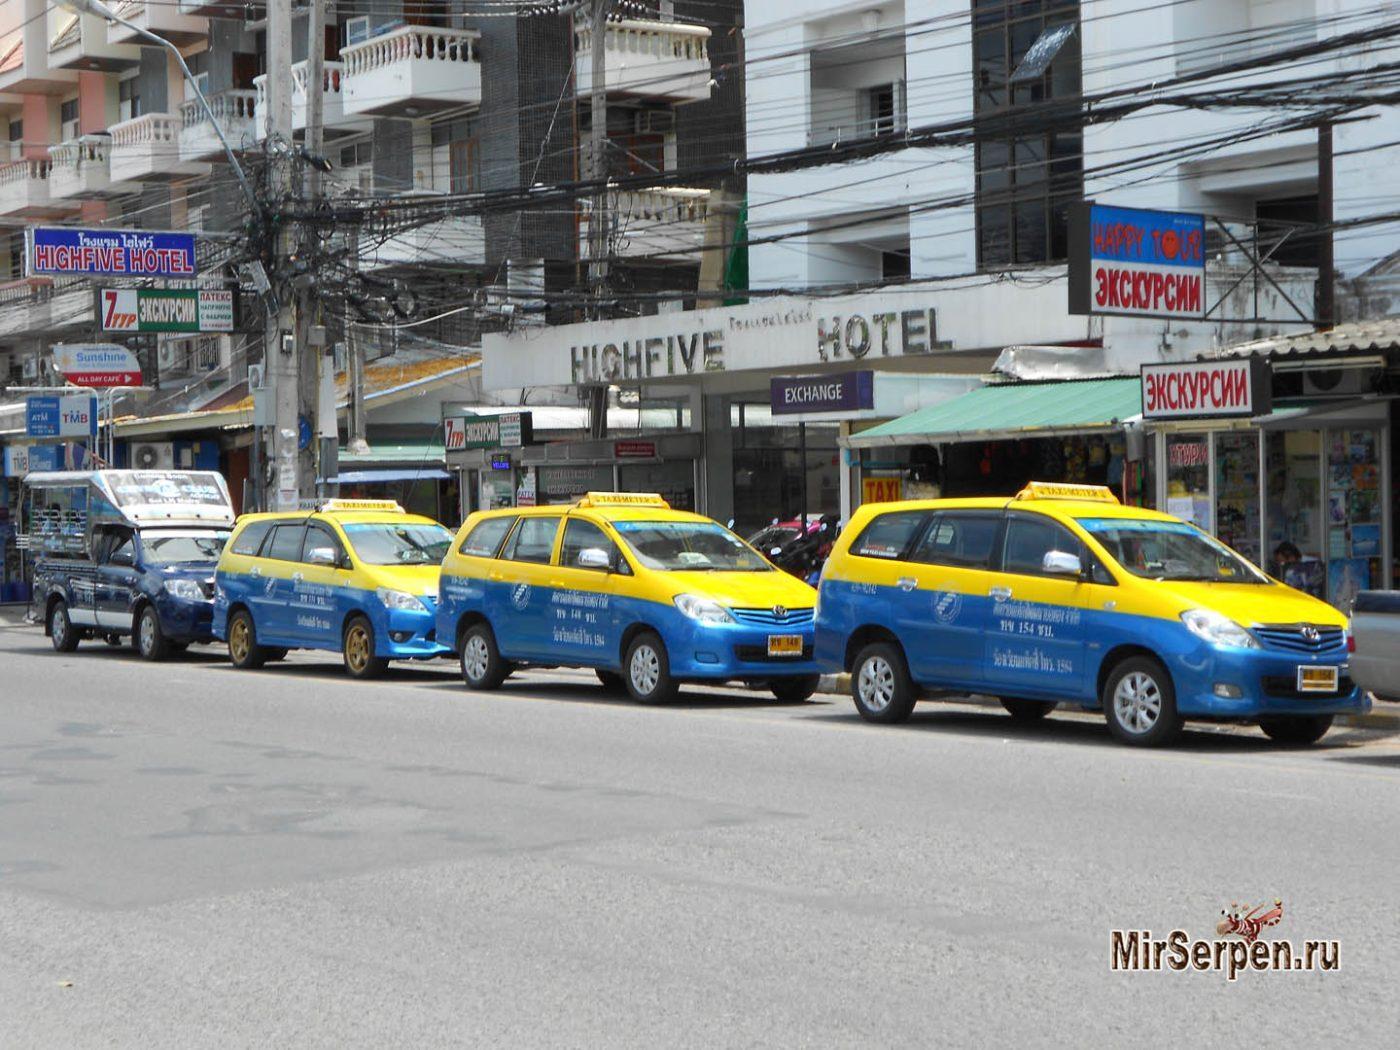 Обзор транспорта в Паттайе: такси